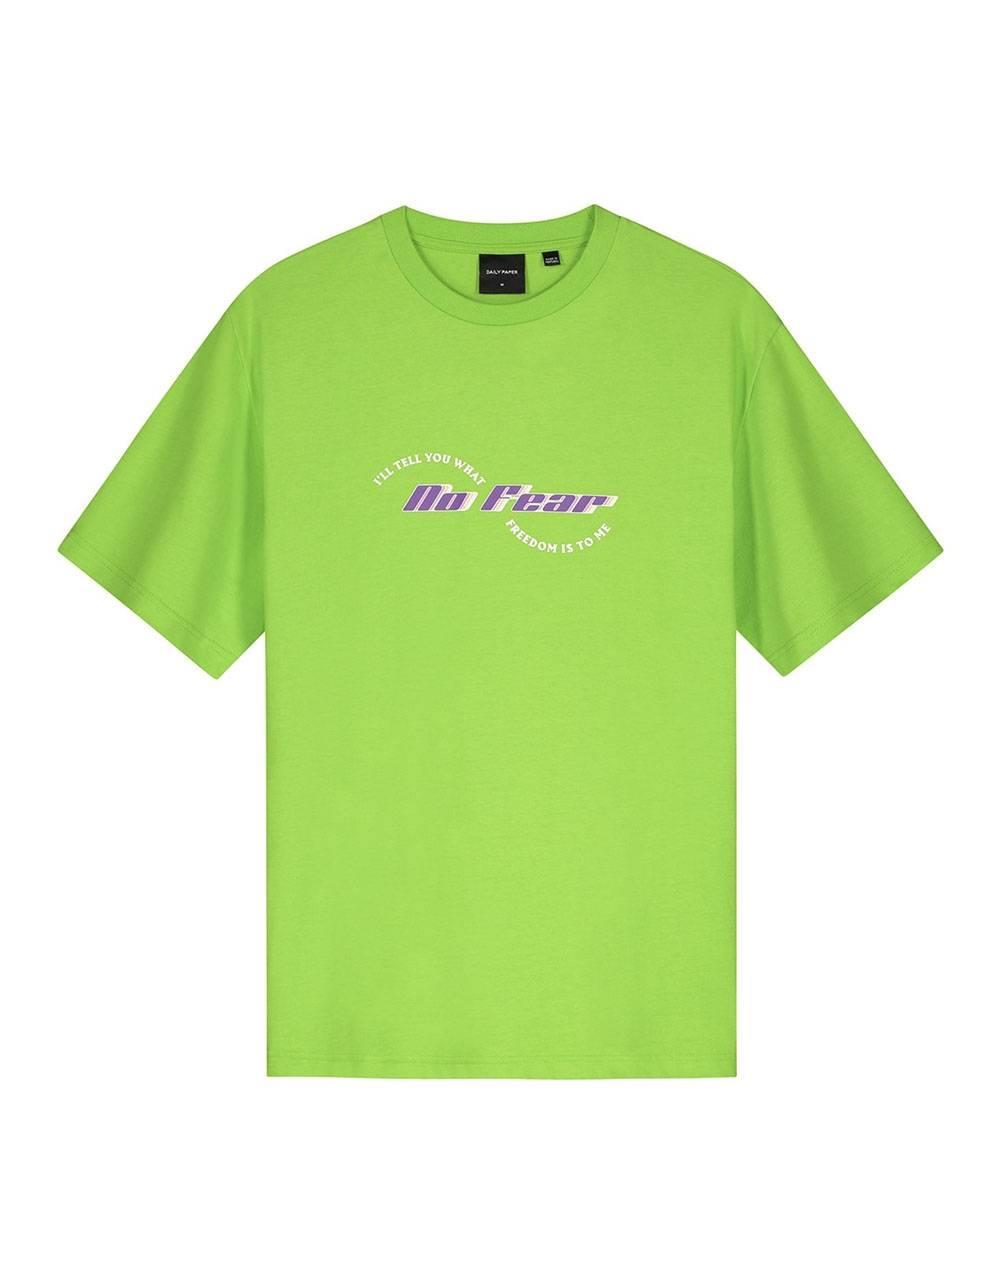 Daily Paper Korjas tee - jasmine green DAILY PAPER T-shirt 62,00€